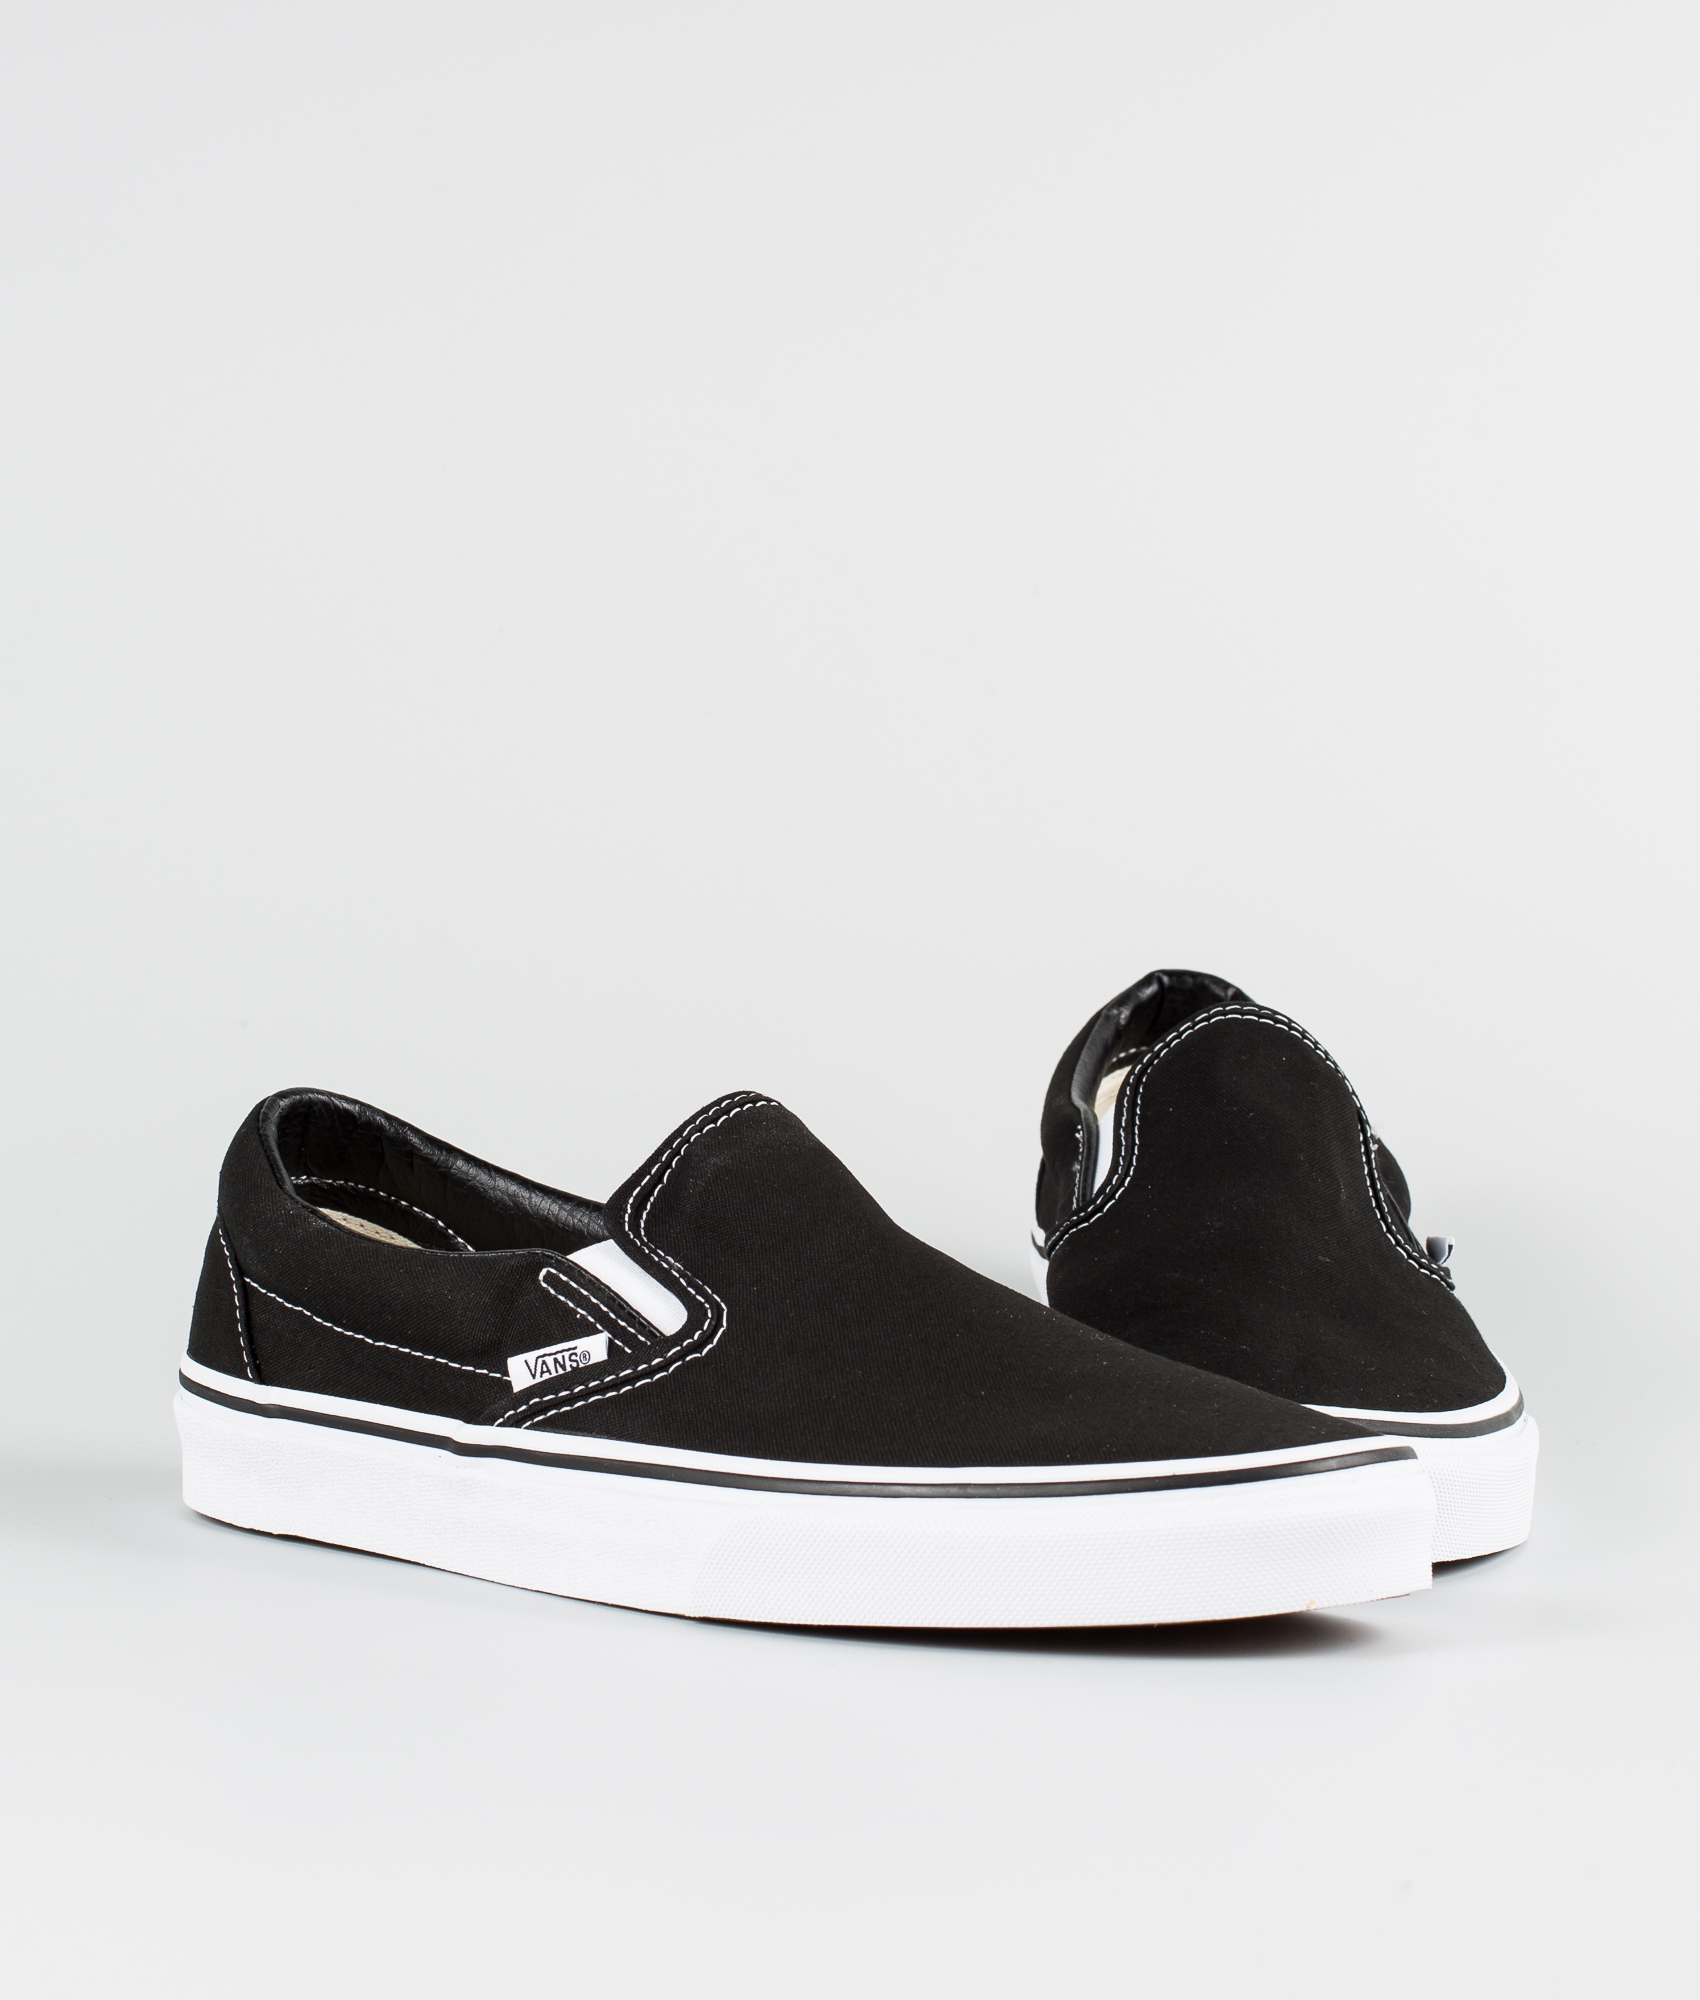 Vans Classic Slip-On Shoes Black